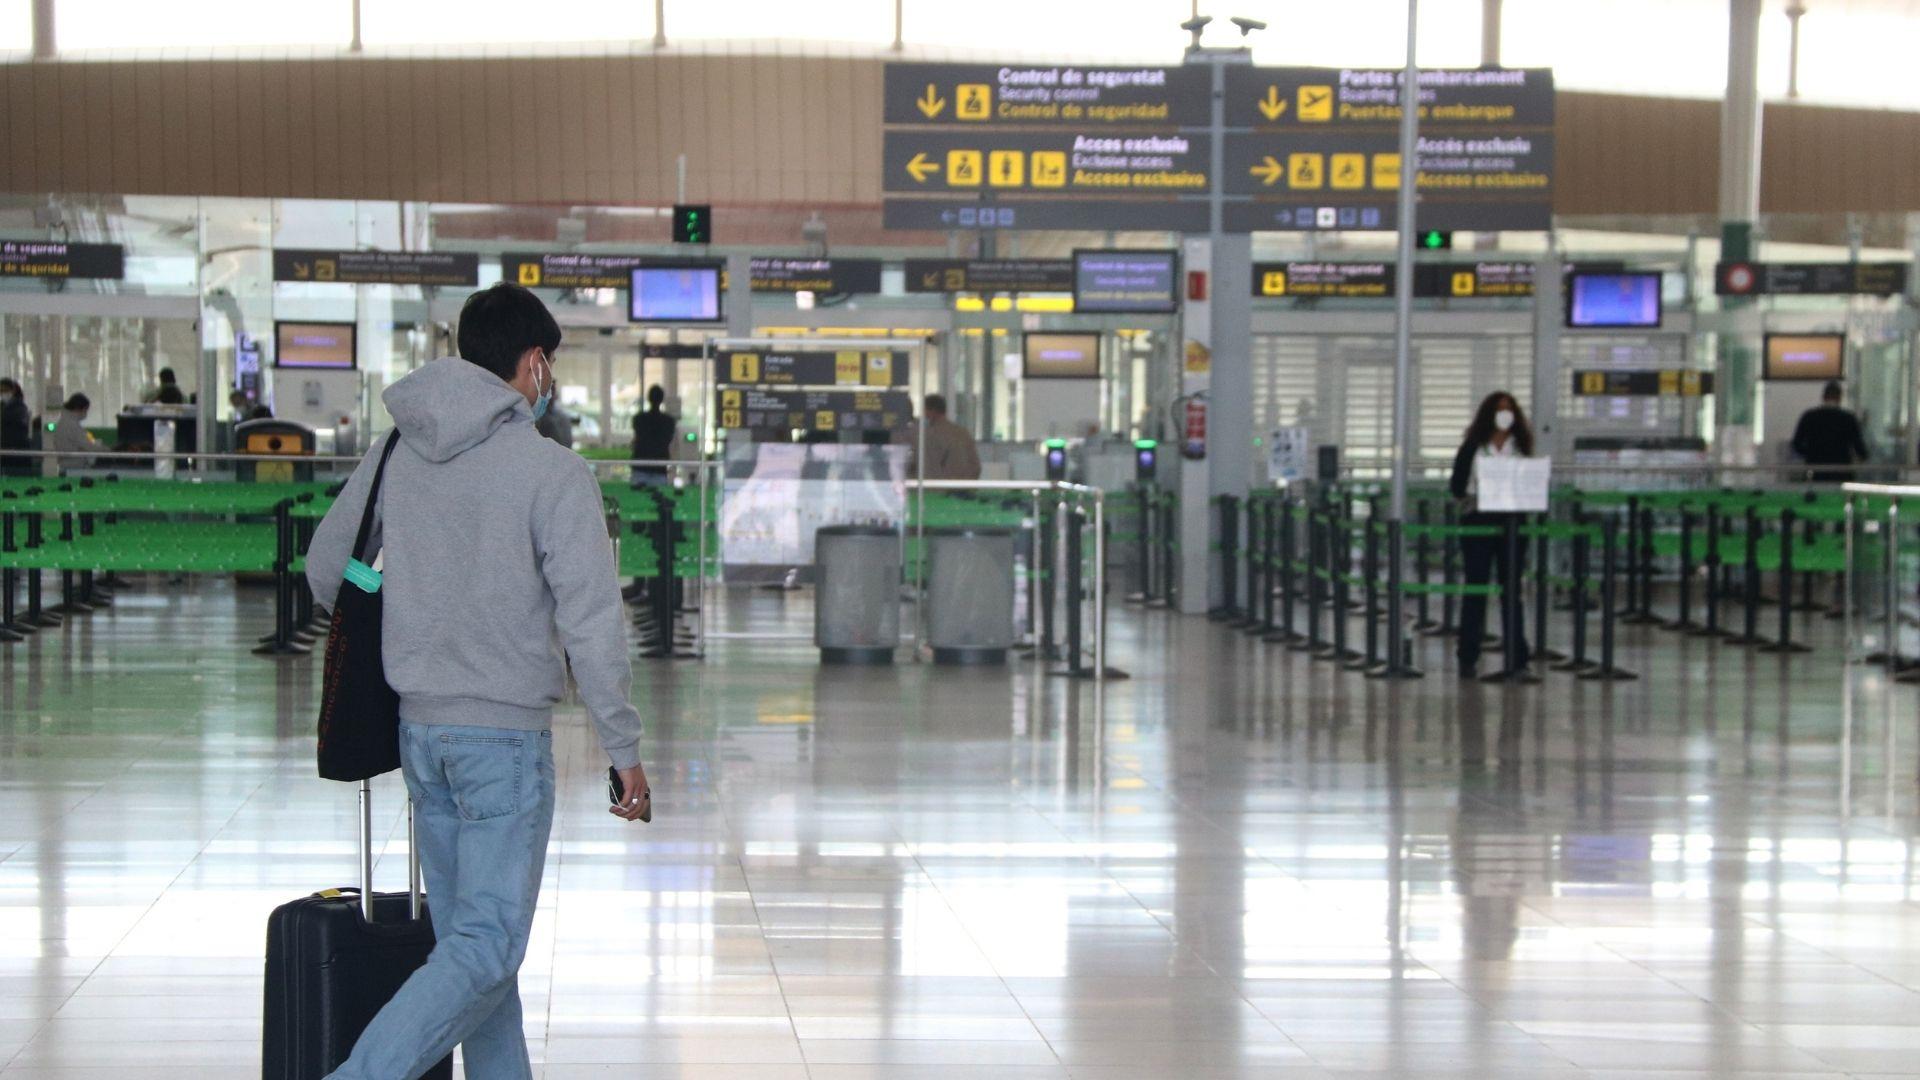 aeroport de barcelona